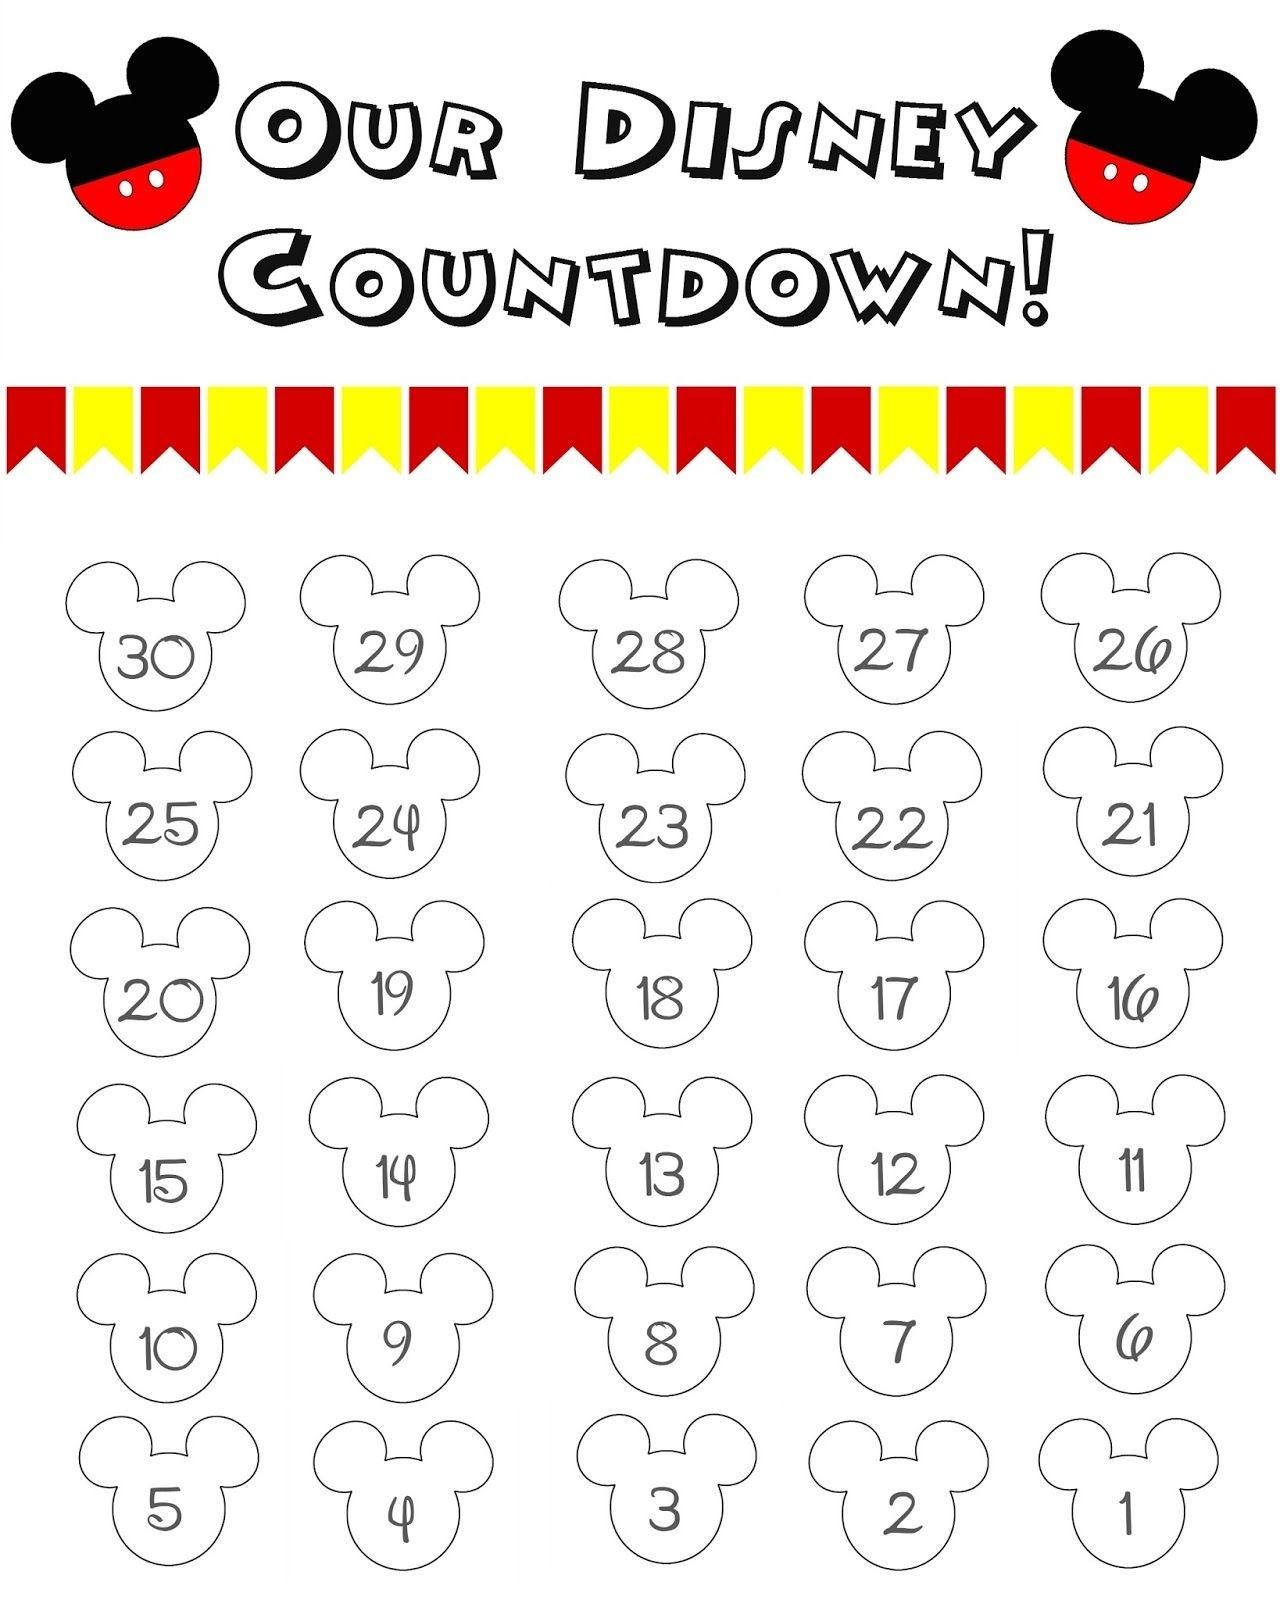 Disney World Countdown Calendar - Free Printable | Disney 100 Day Countdown Calendar Printable